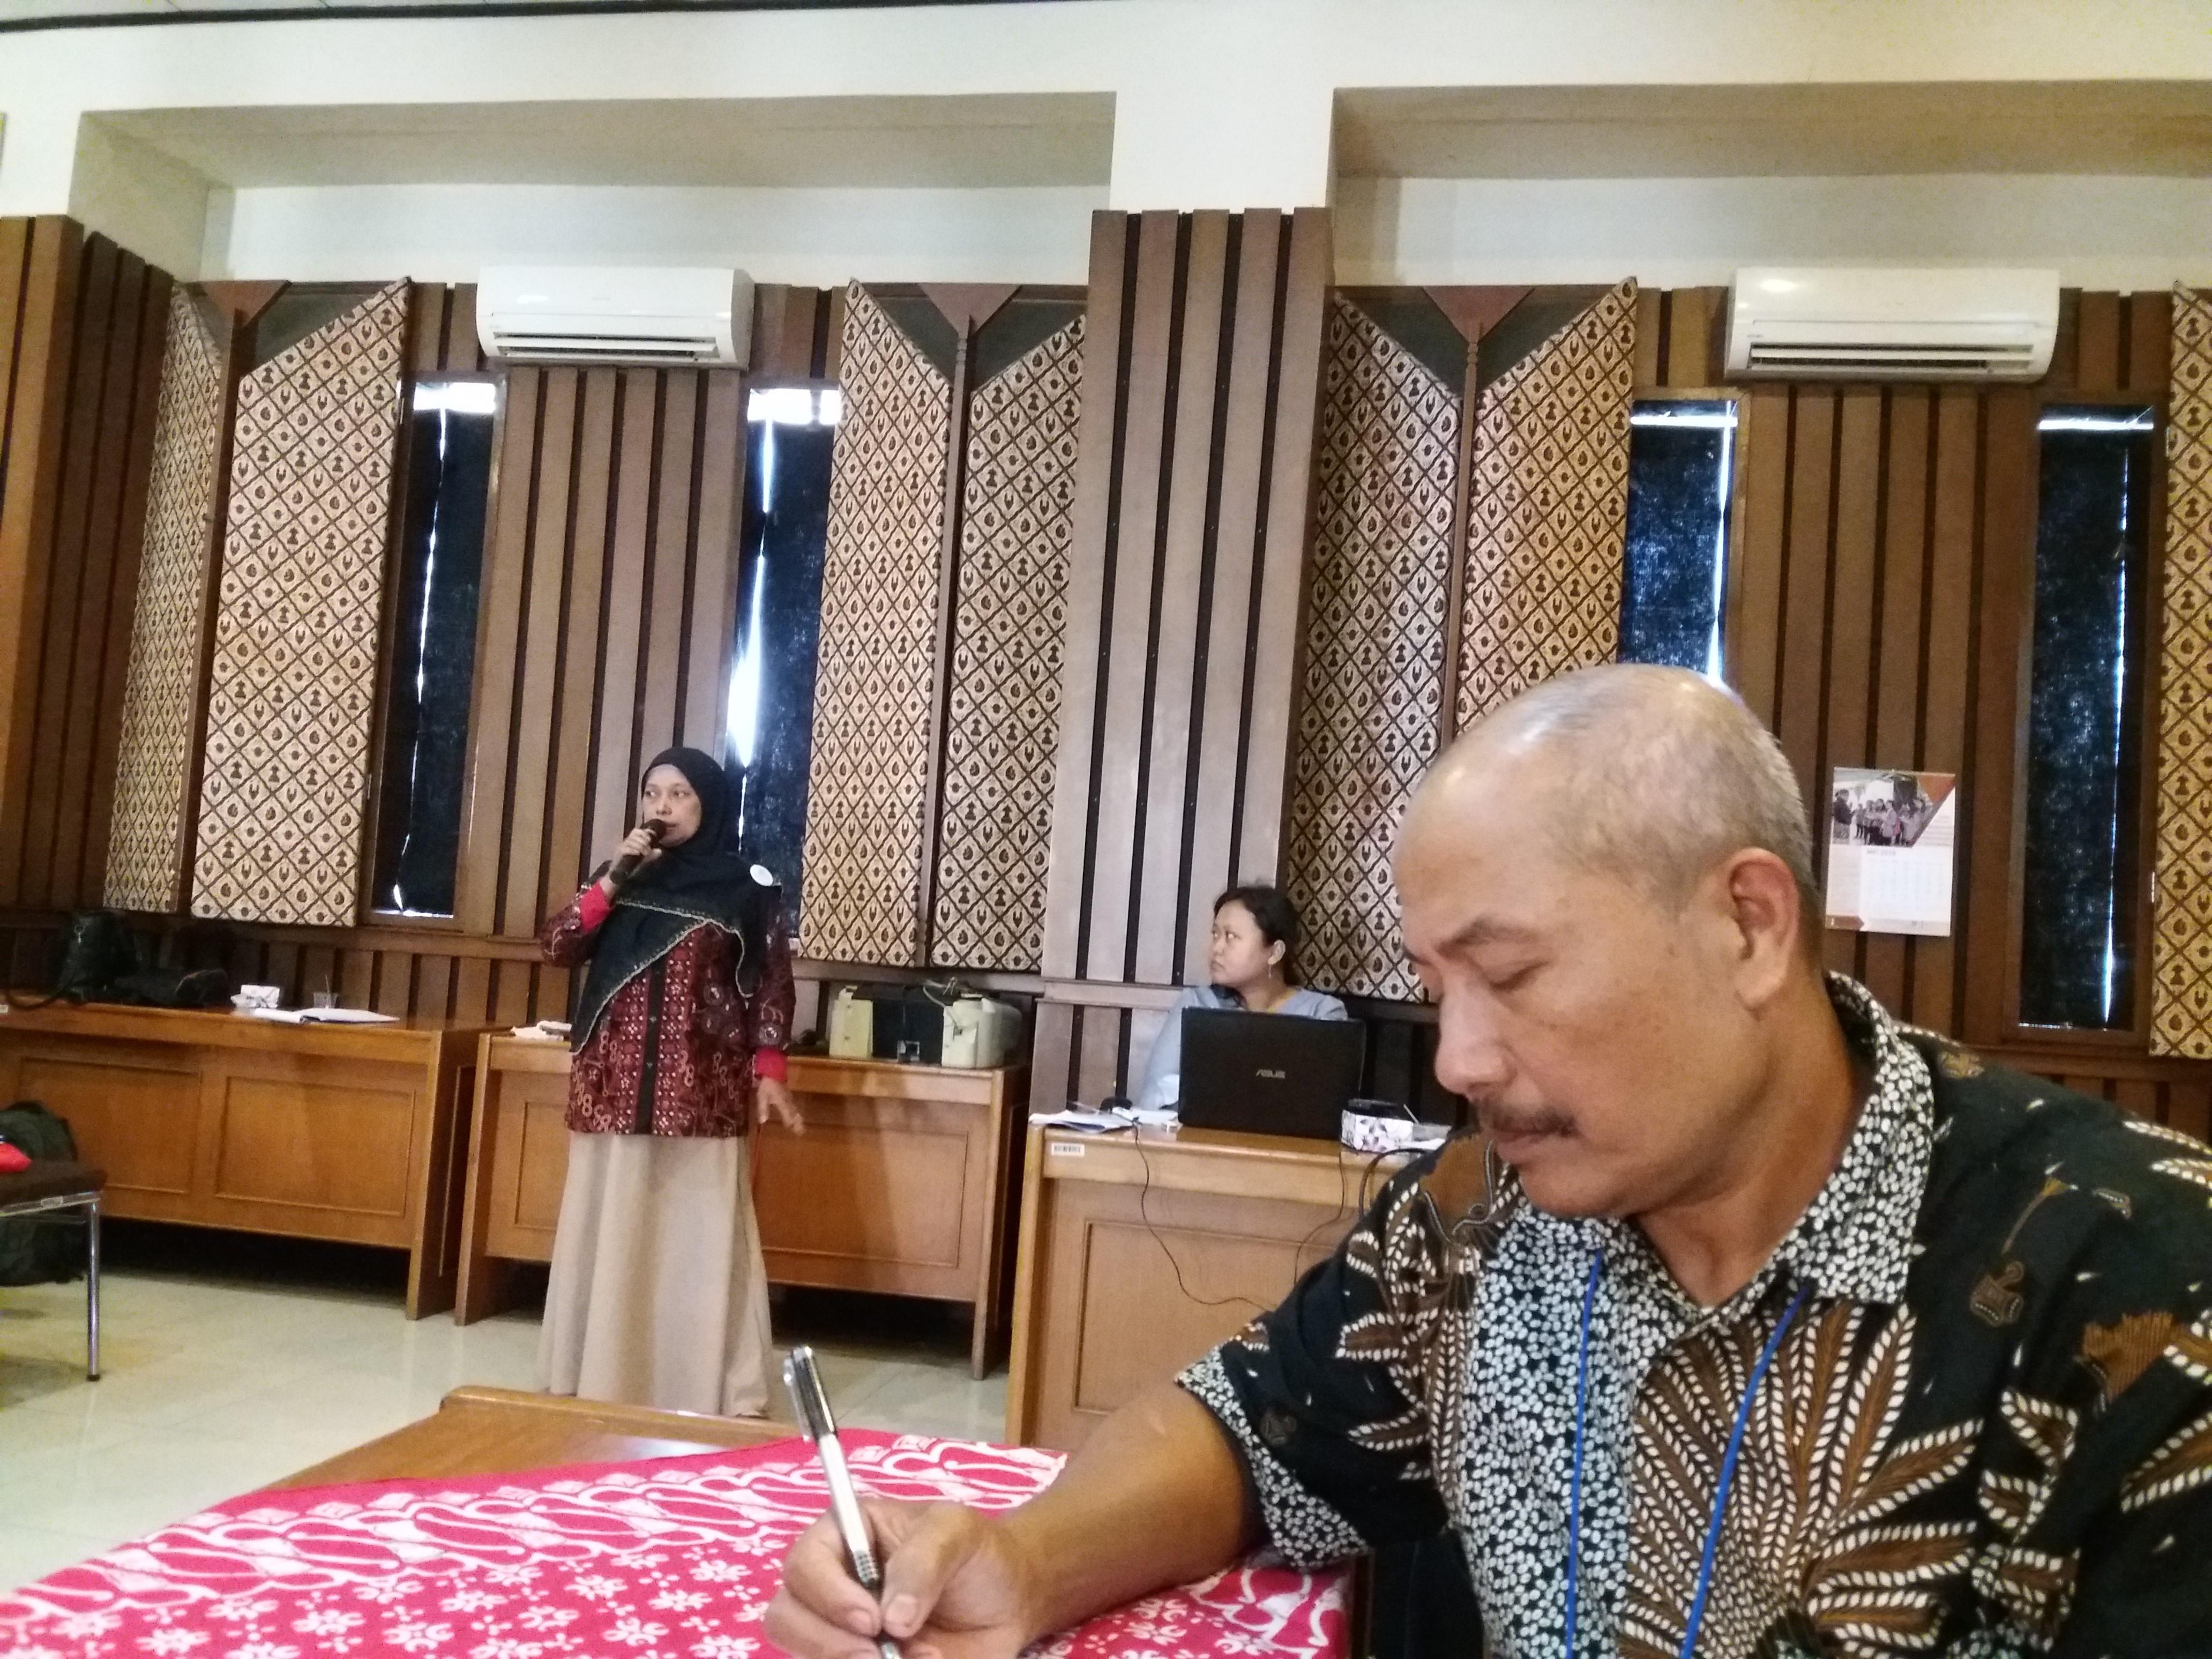 Sukahadi takes notes during the workshop.